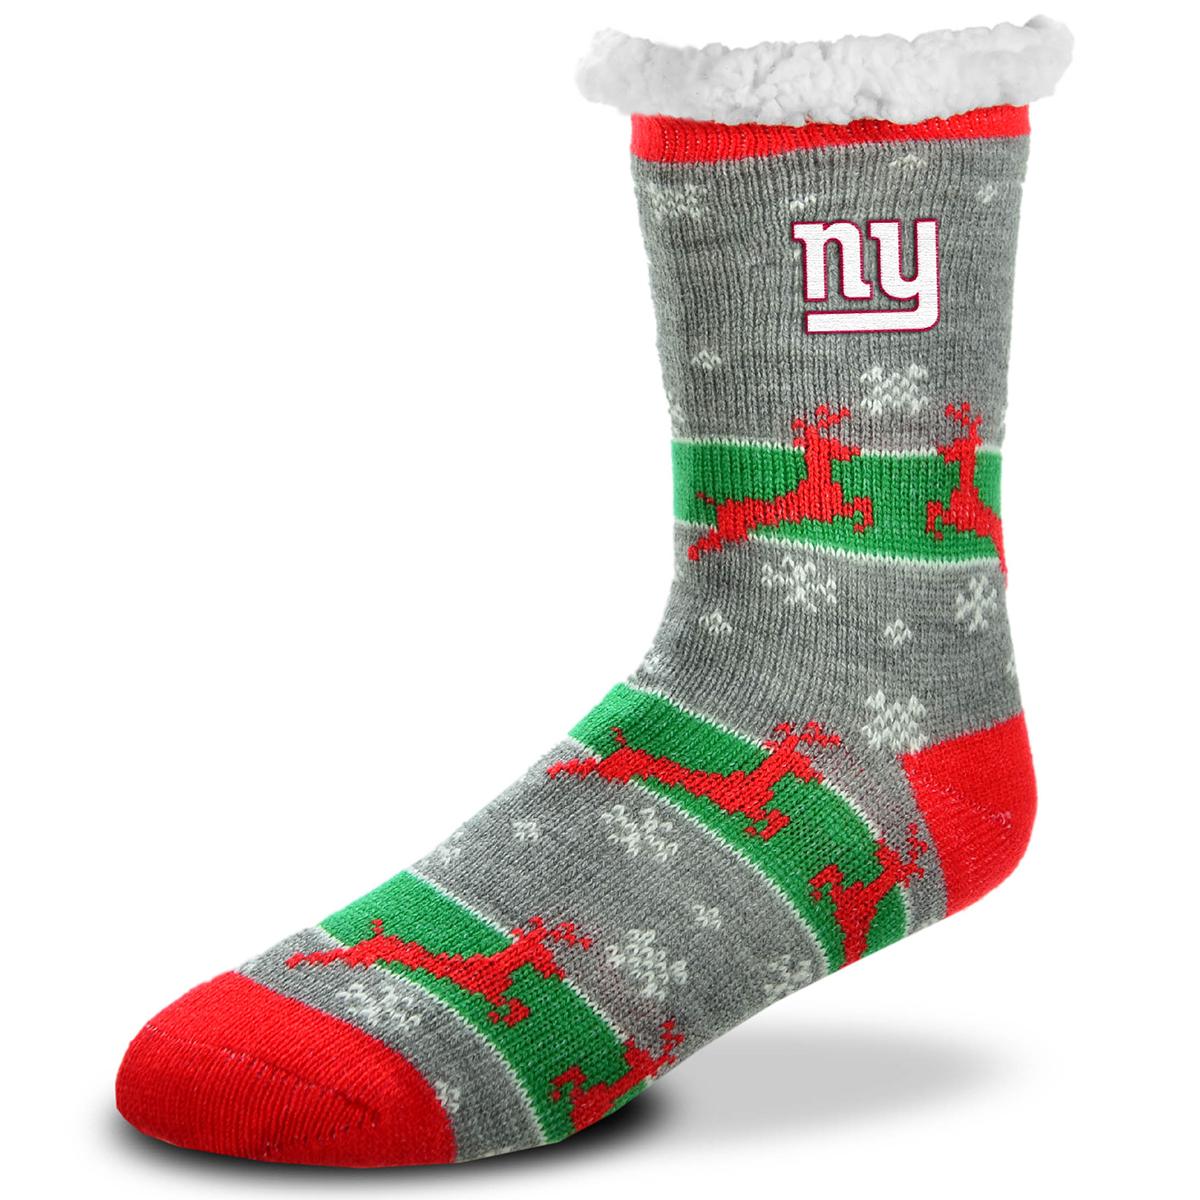 New York Giants Unisex Sherpa Lined Holiday Reindeer Socks